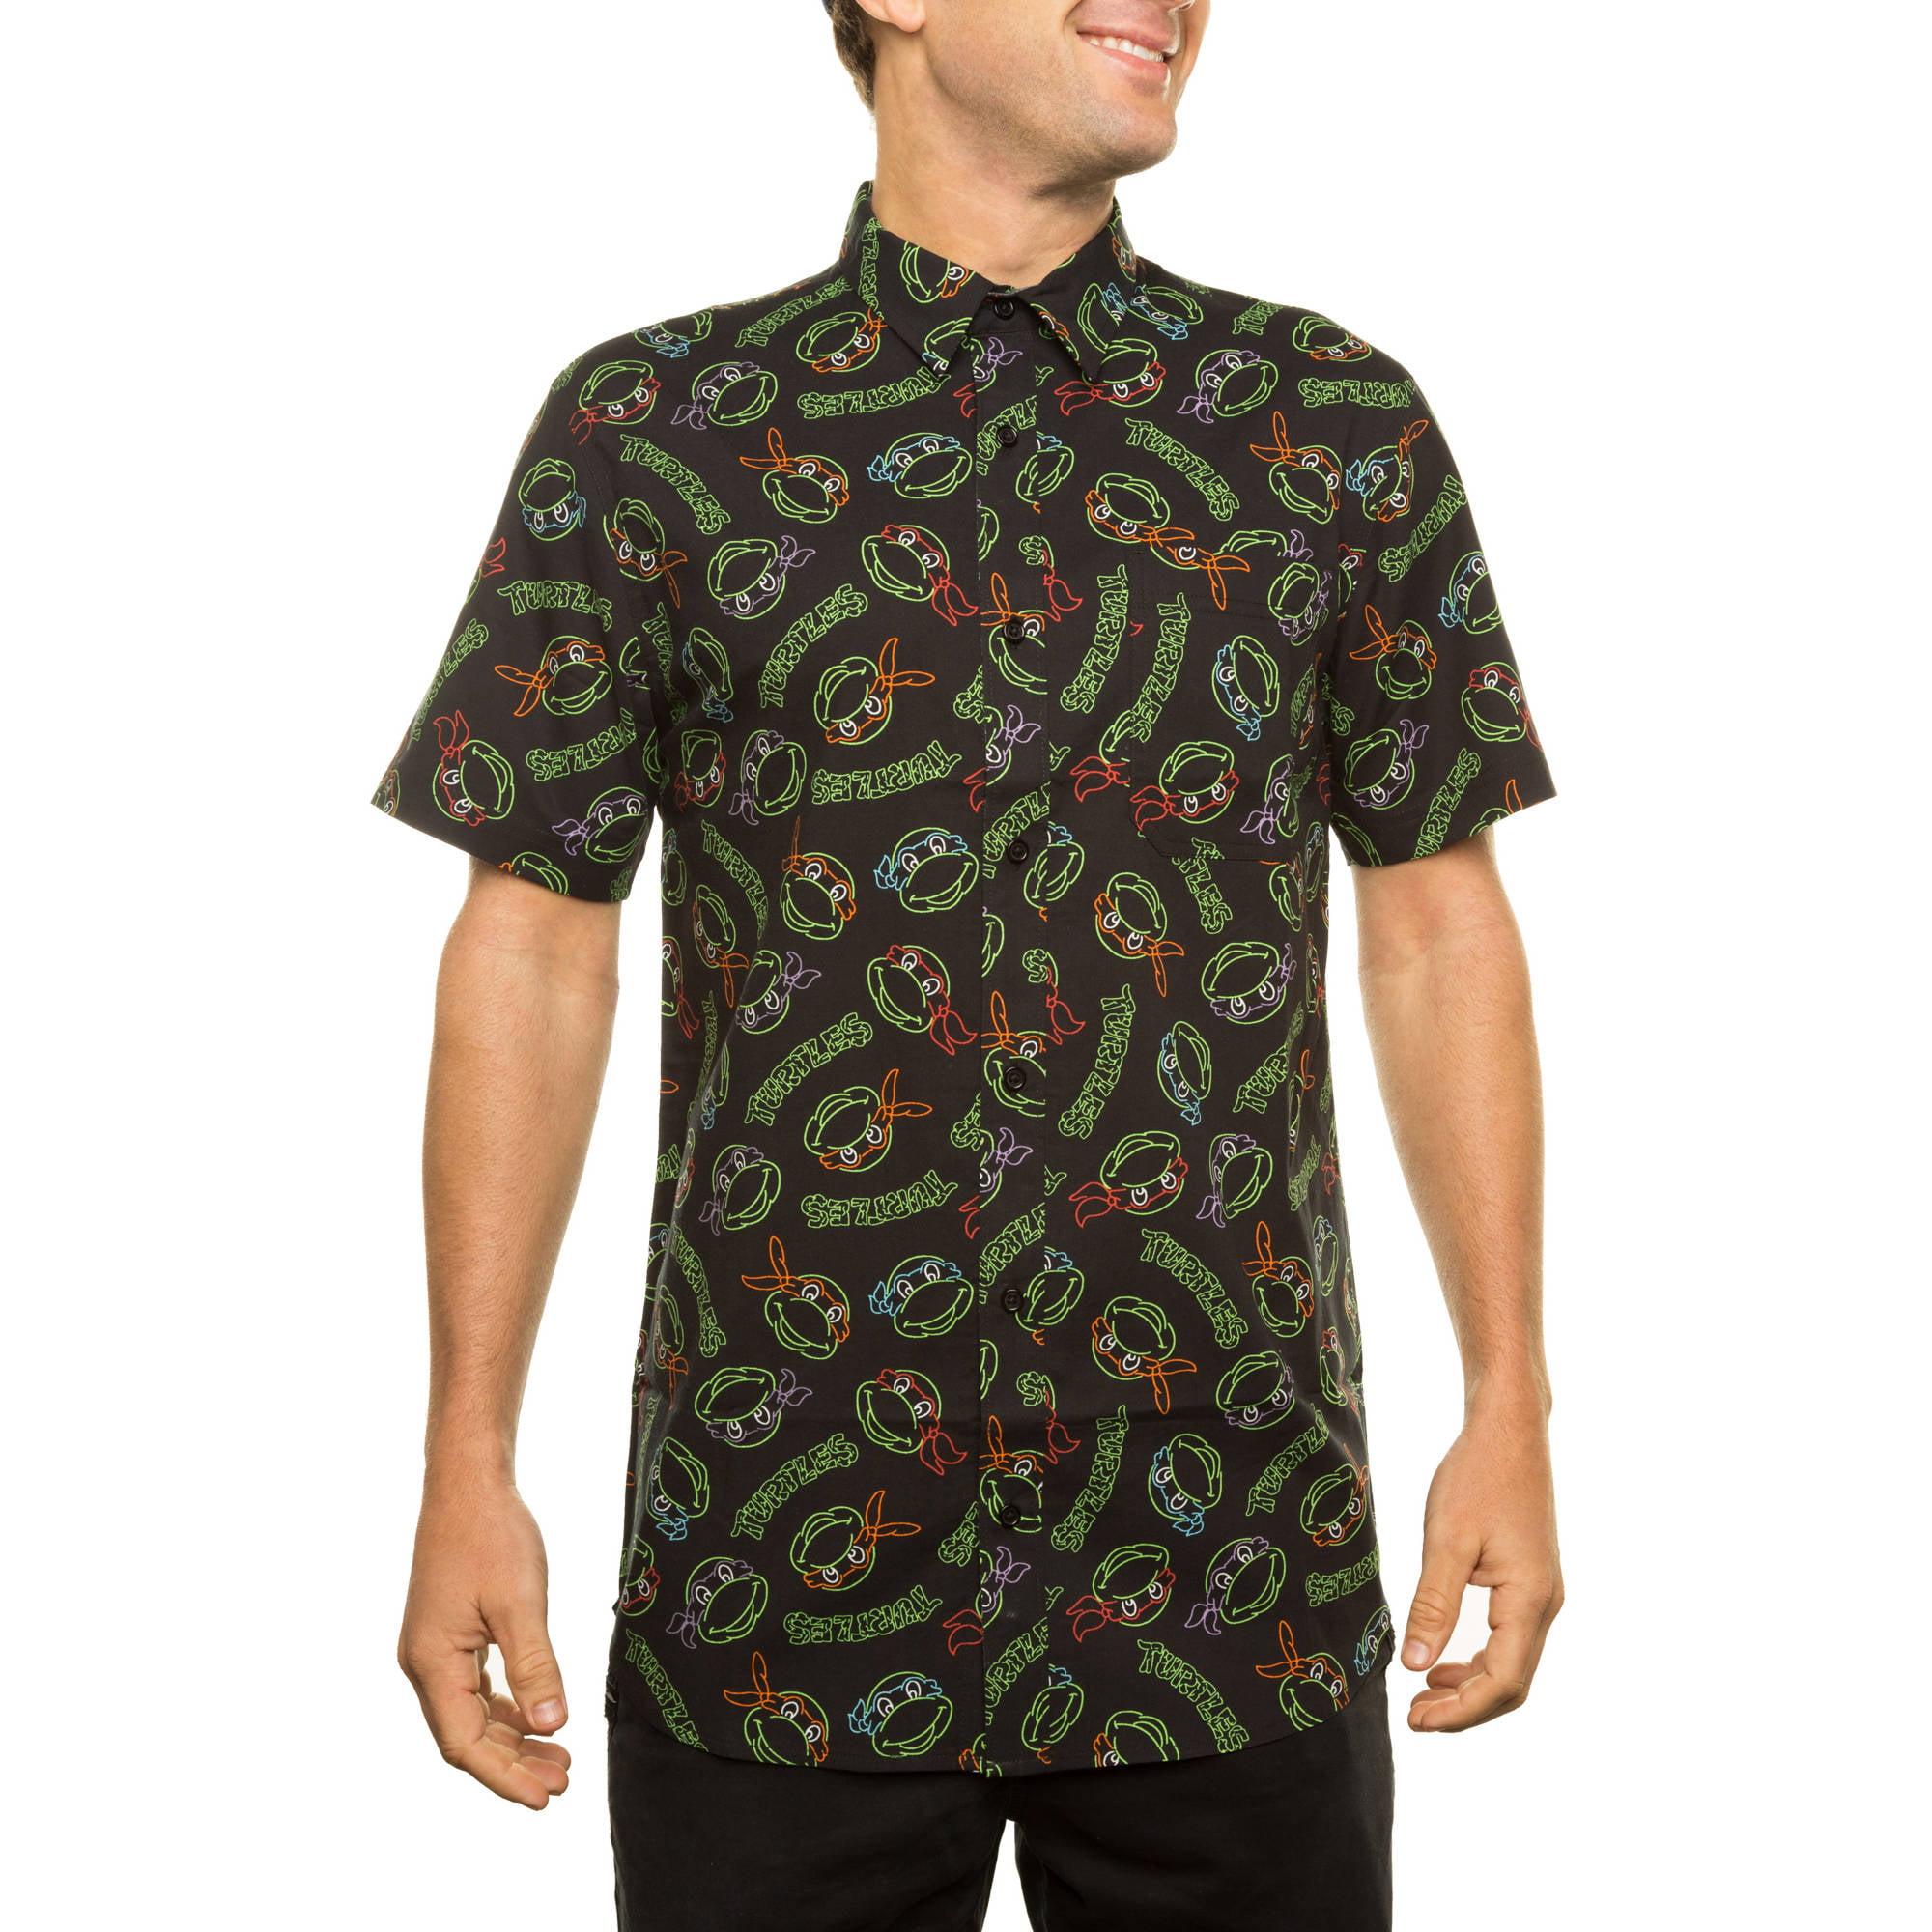 Teenage Mutant Ninja Turtles All Over Printed Men's SS Woven Shirt